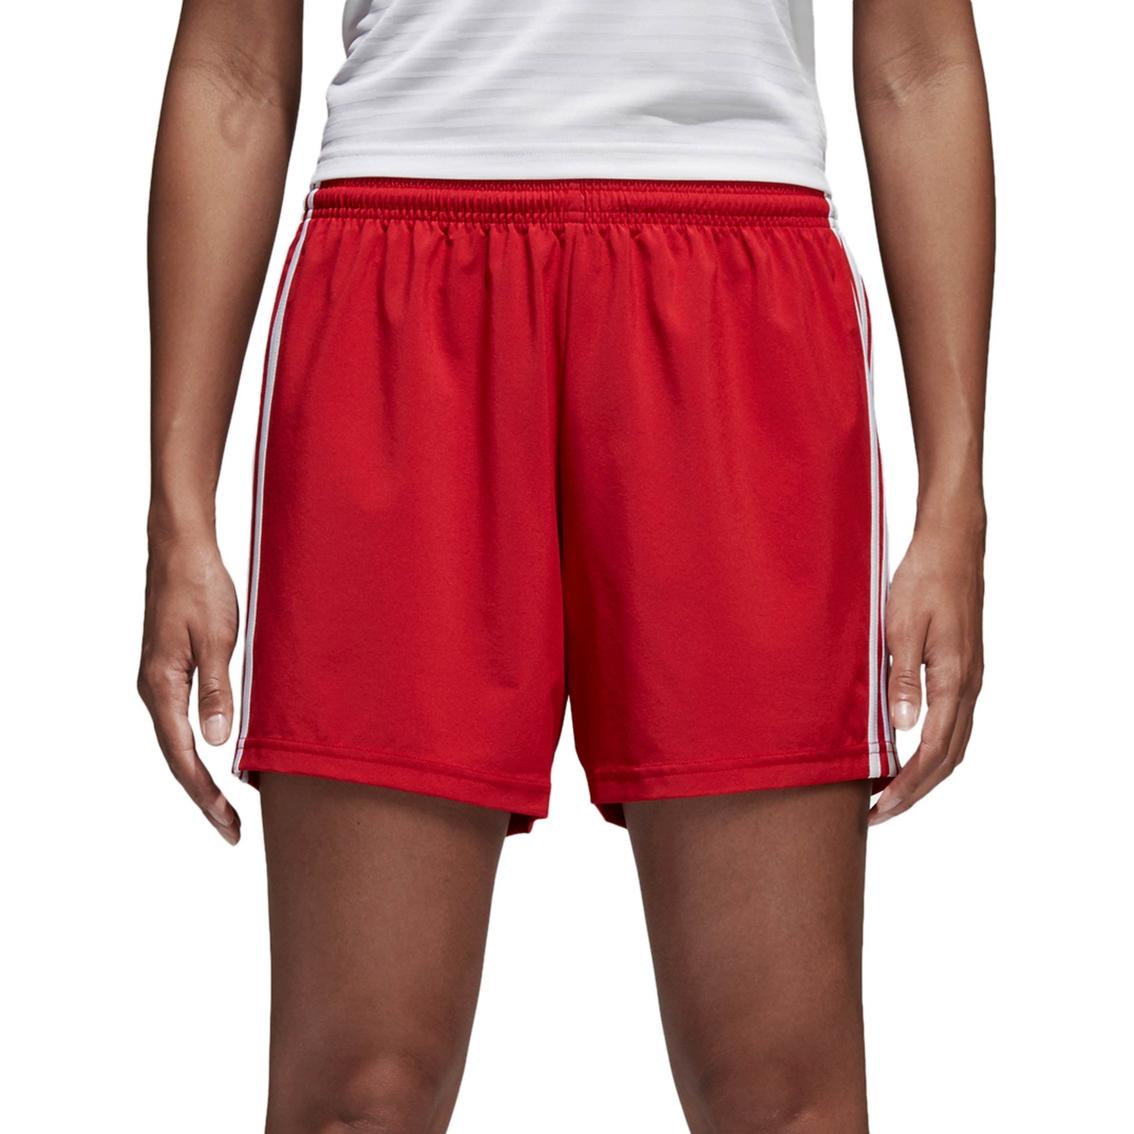 2b8945a3556c7 Adidas Condivo 18 Shorts | Shorts | Apparel | Shop The Exchange